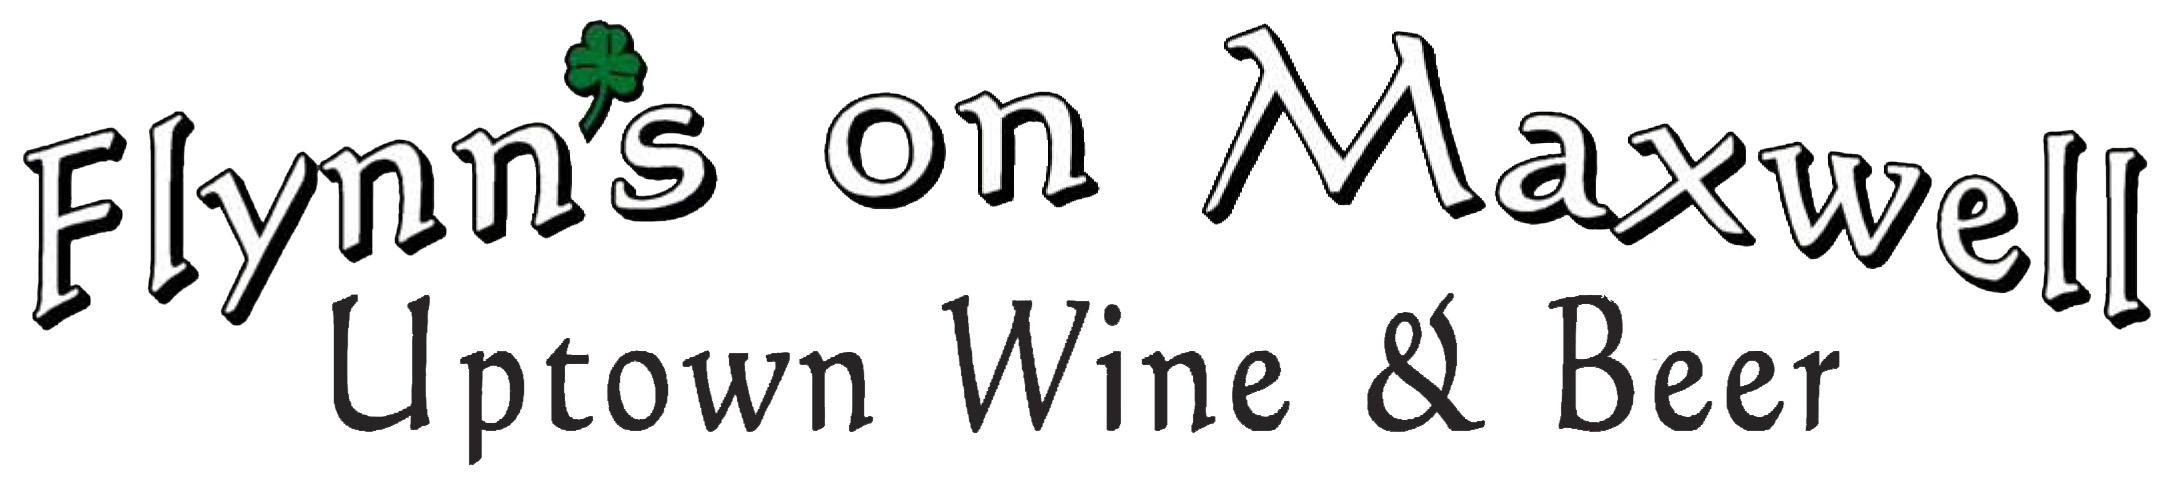 Event - Flynn Logo-text only.jpg